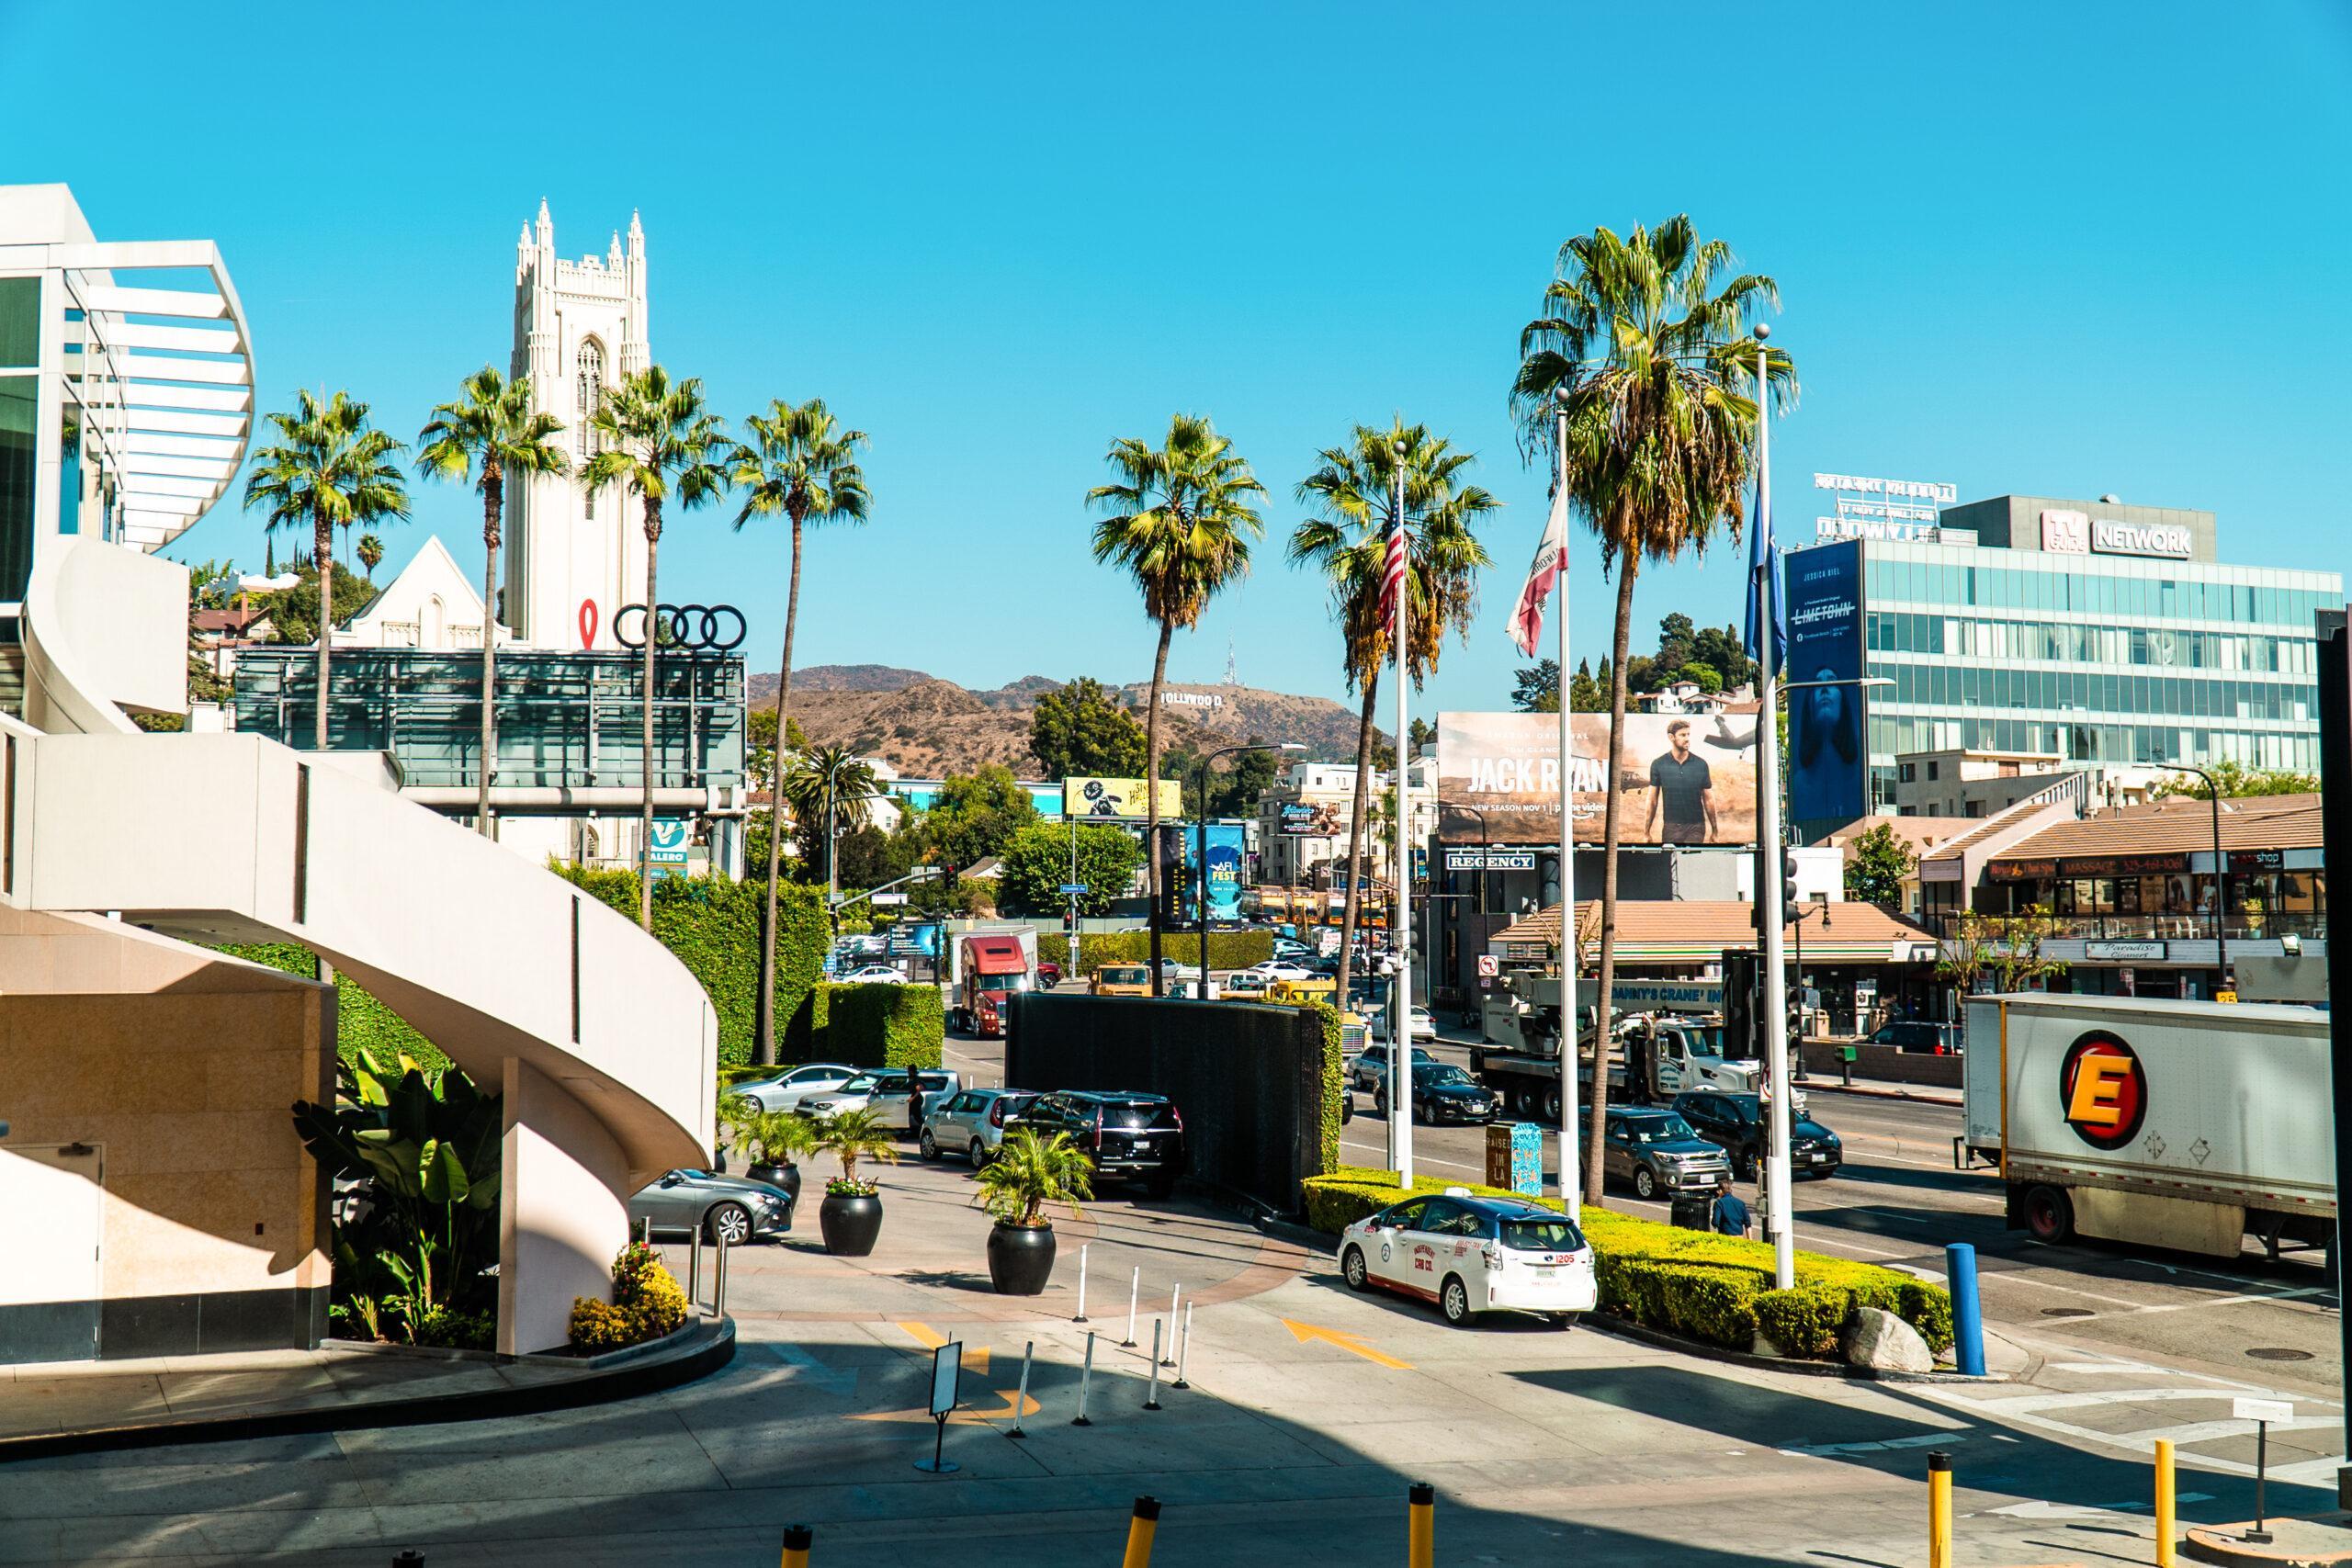 Los Angeles - Etats Unis